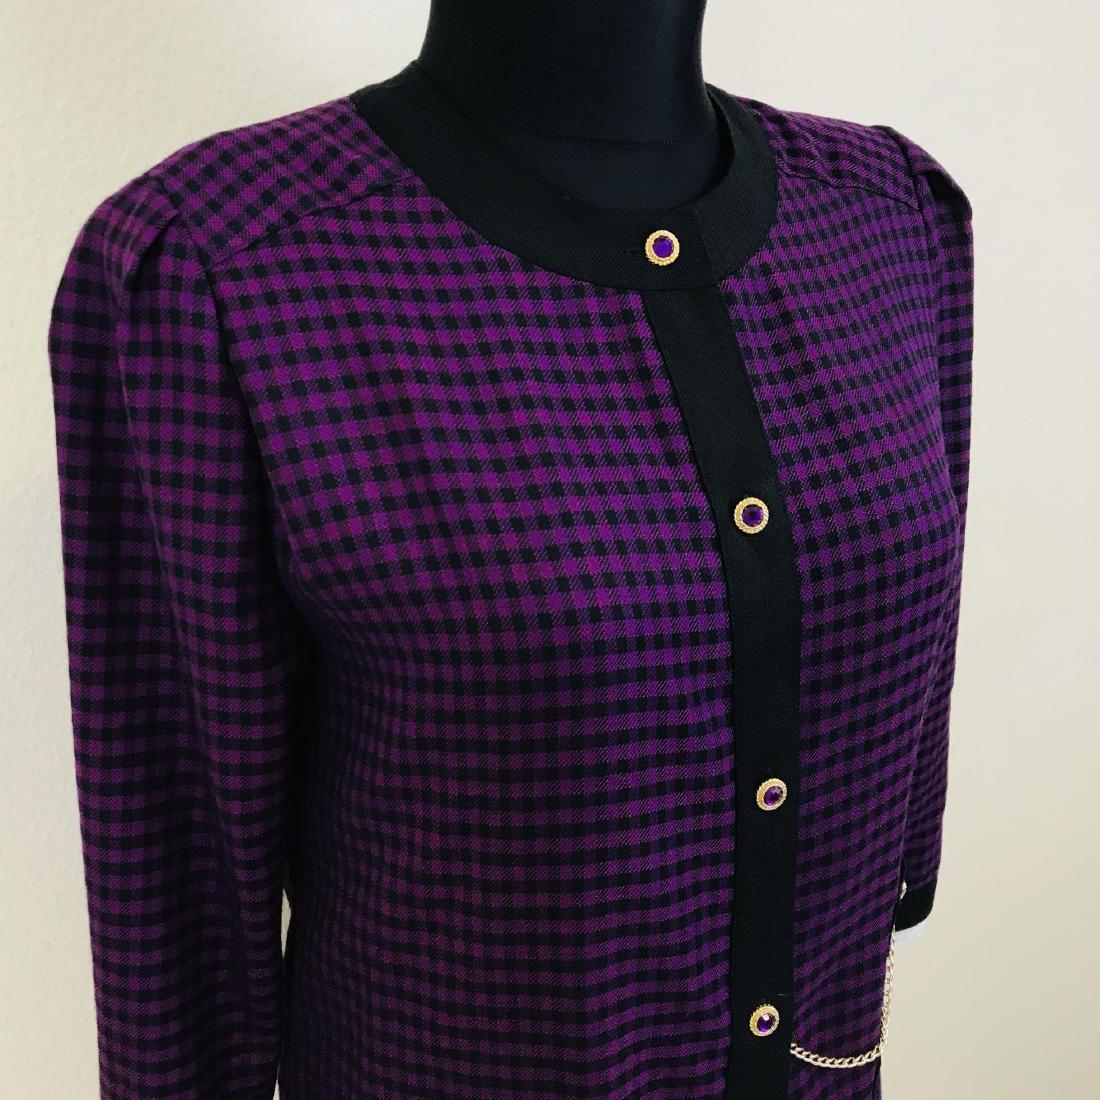 Vintage Women's Blazer Jacket - 3